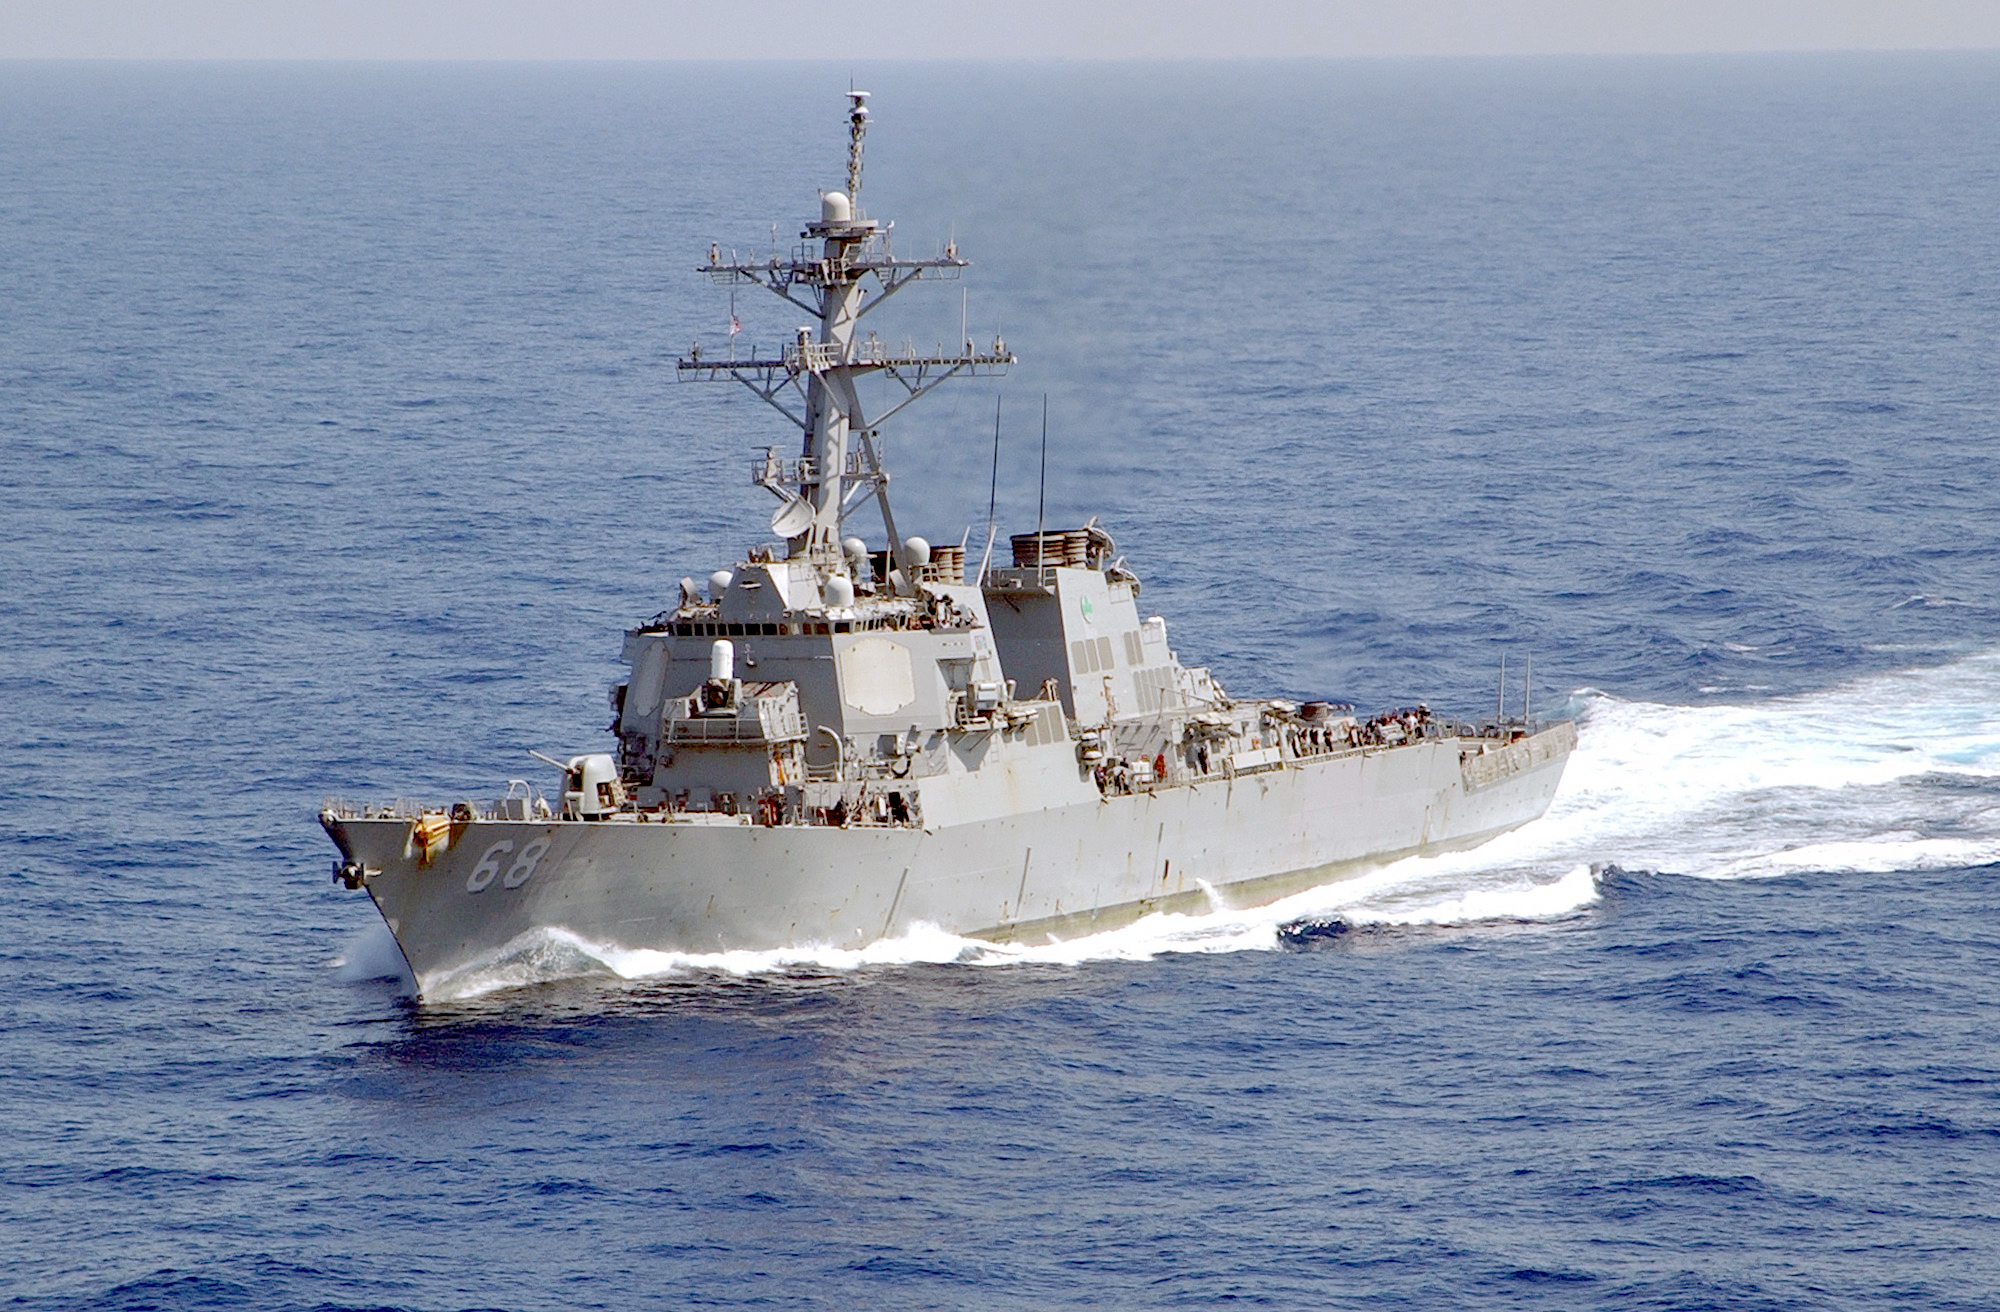 USS The Sullivans in the Mediterranean Sea.